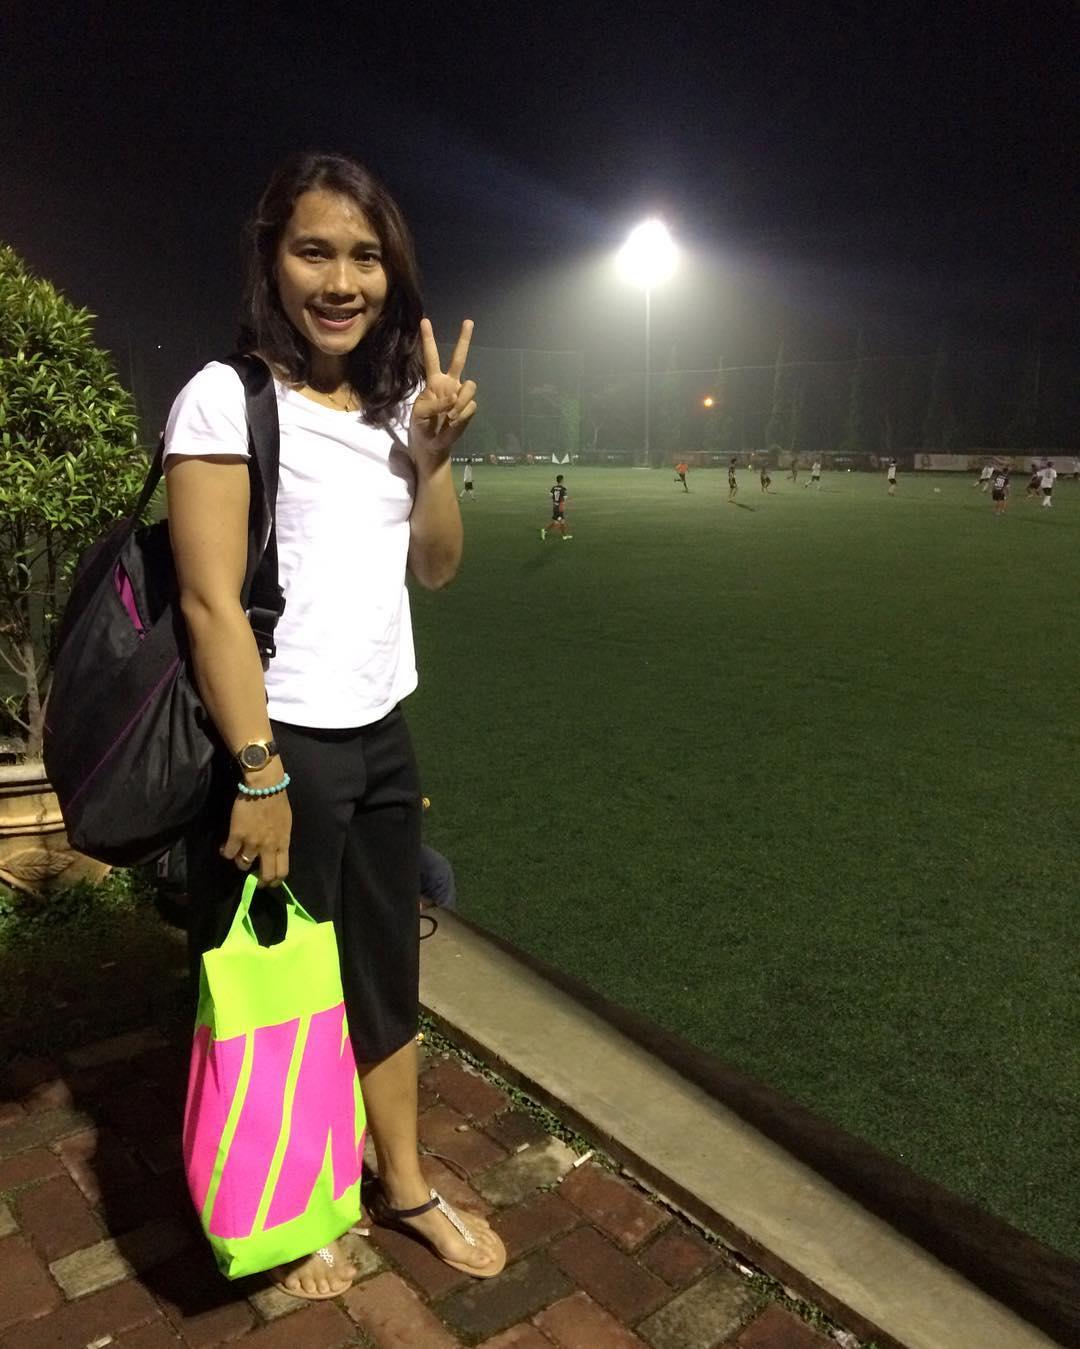 Lapang FootballPlus Arena